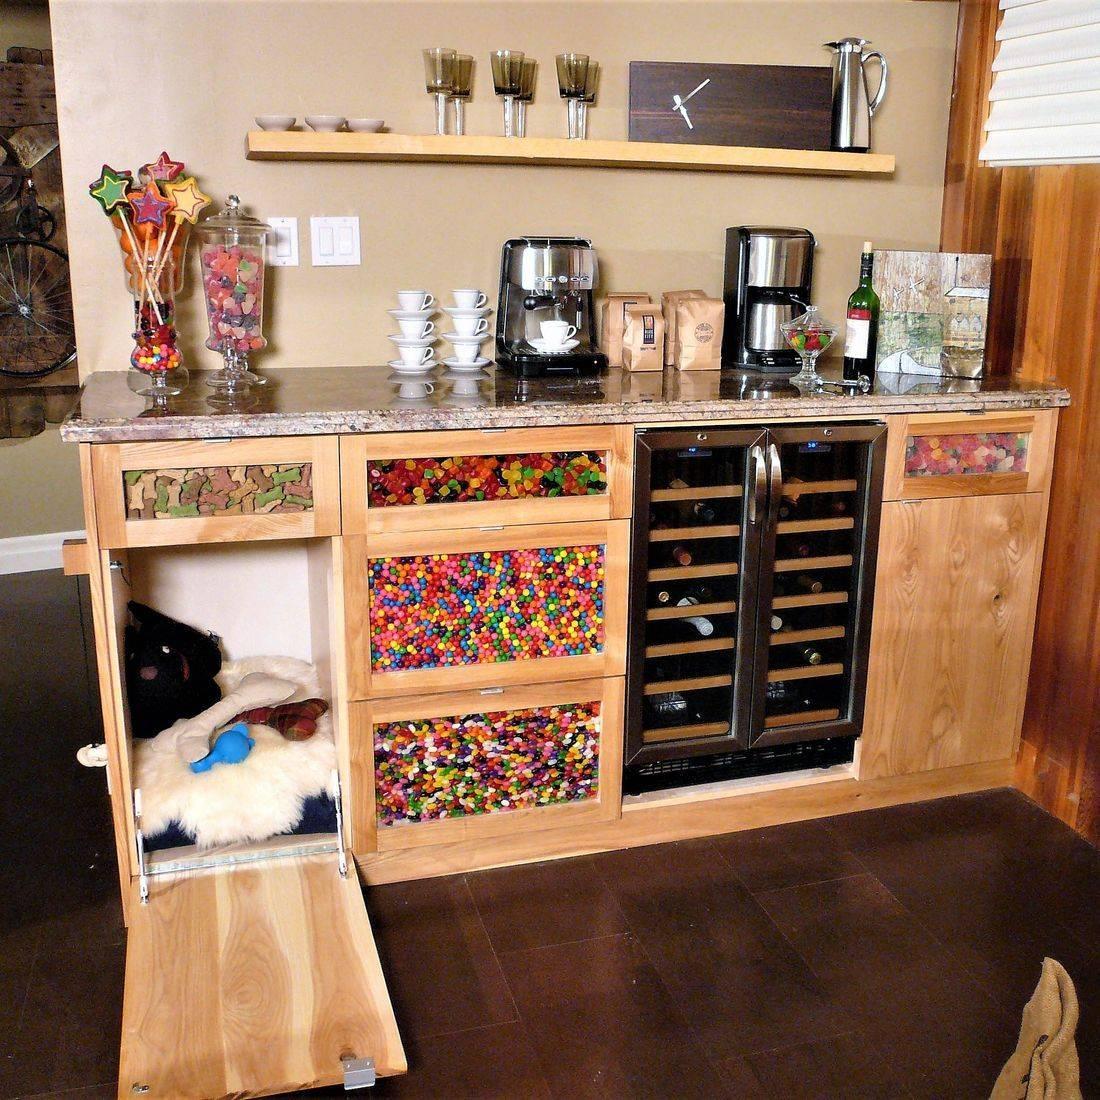 Sibra Kitchens Markham Toronto HGTV basement bar cabinets